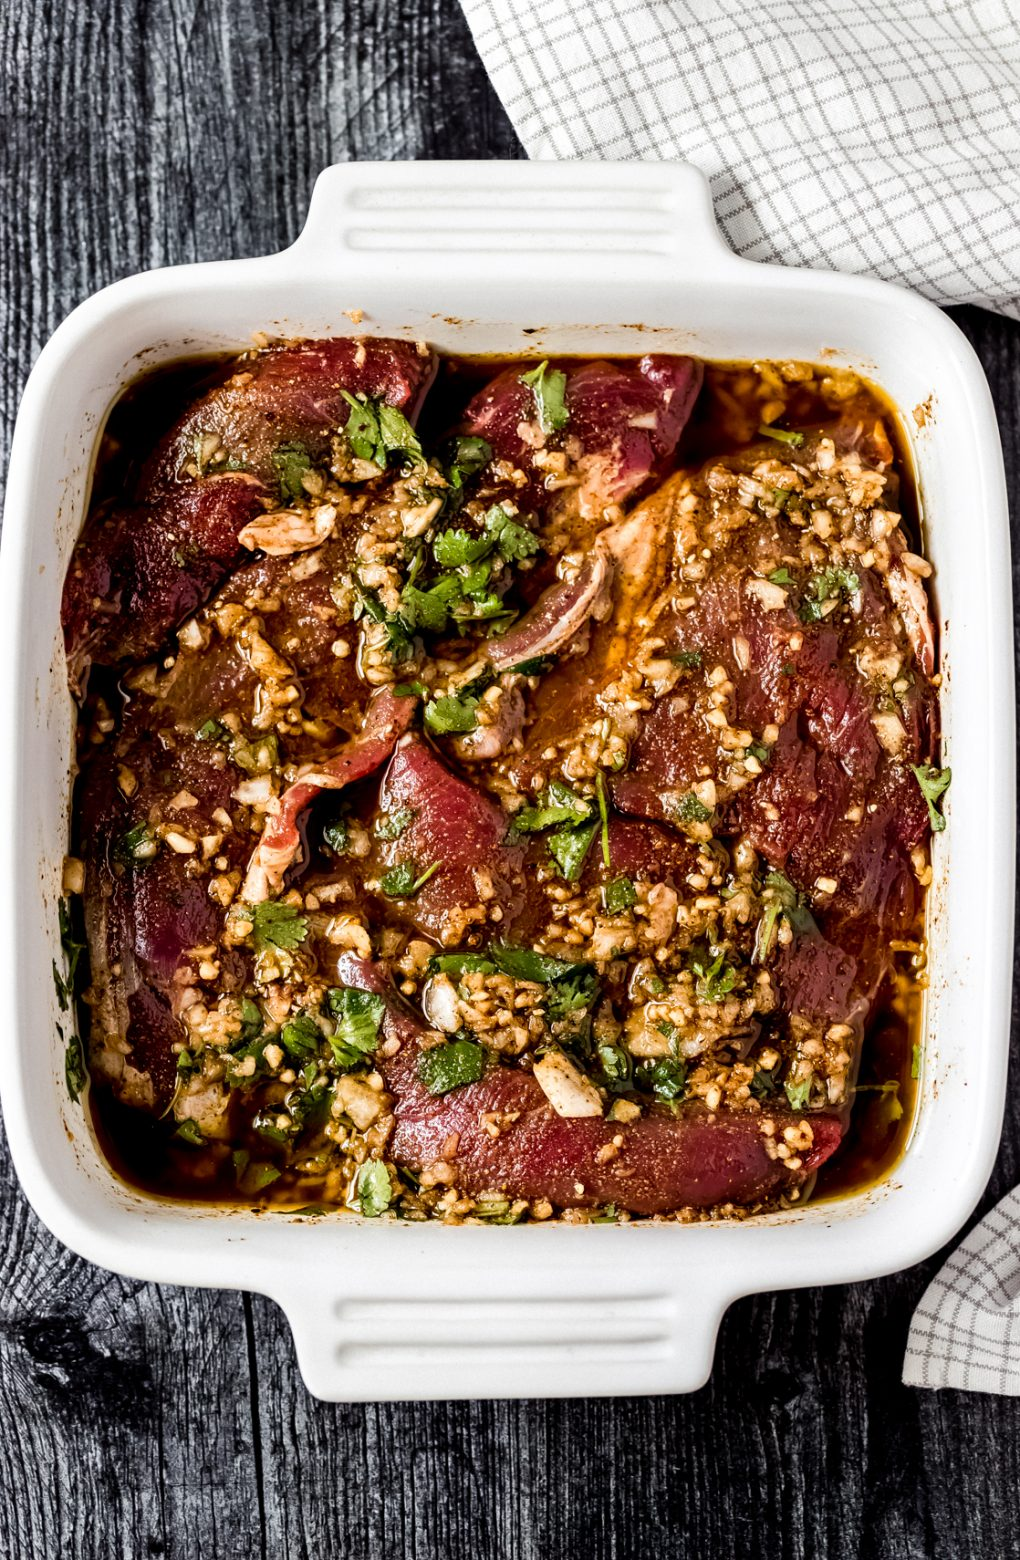 elk flank steak marinading in a white dish